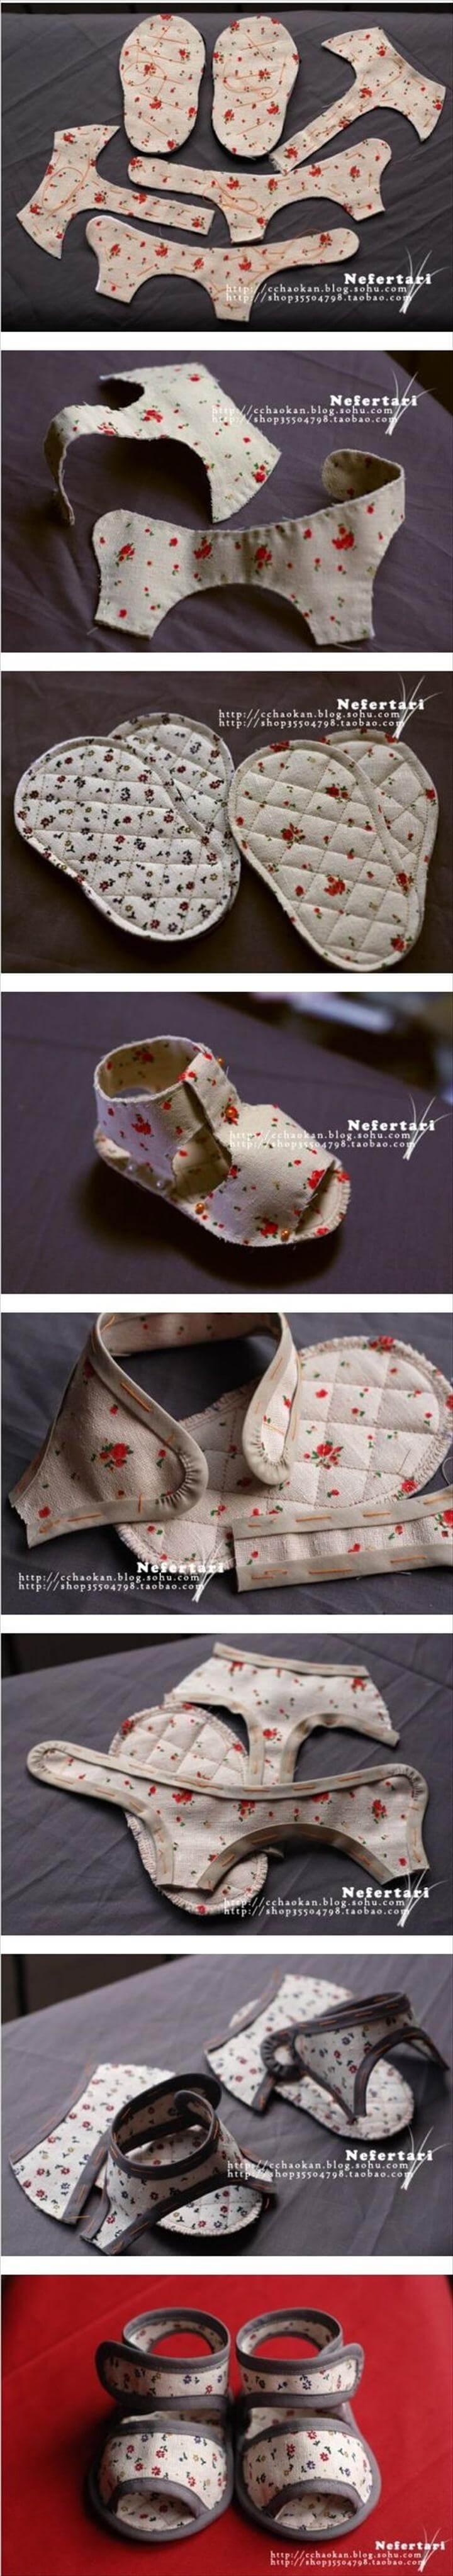 handmade stunning baby sandals